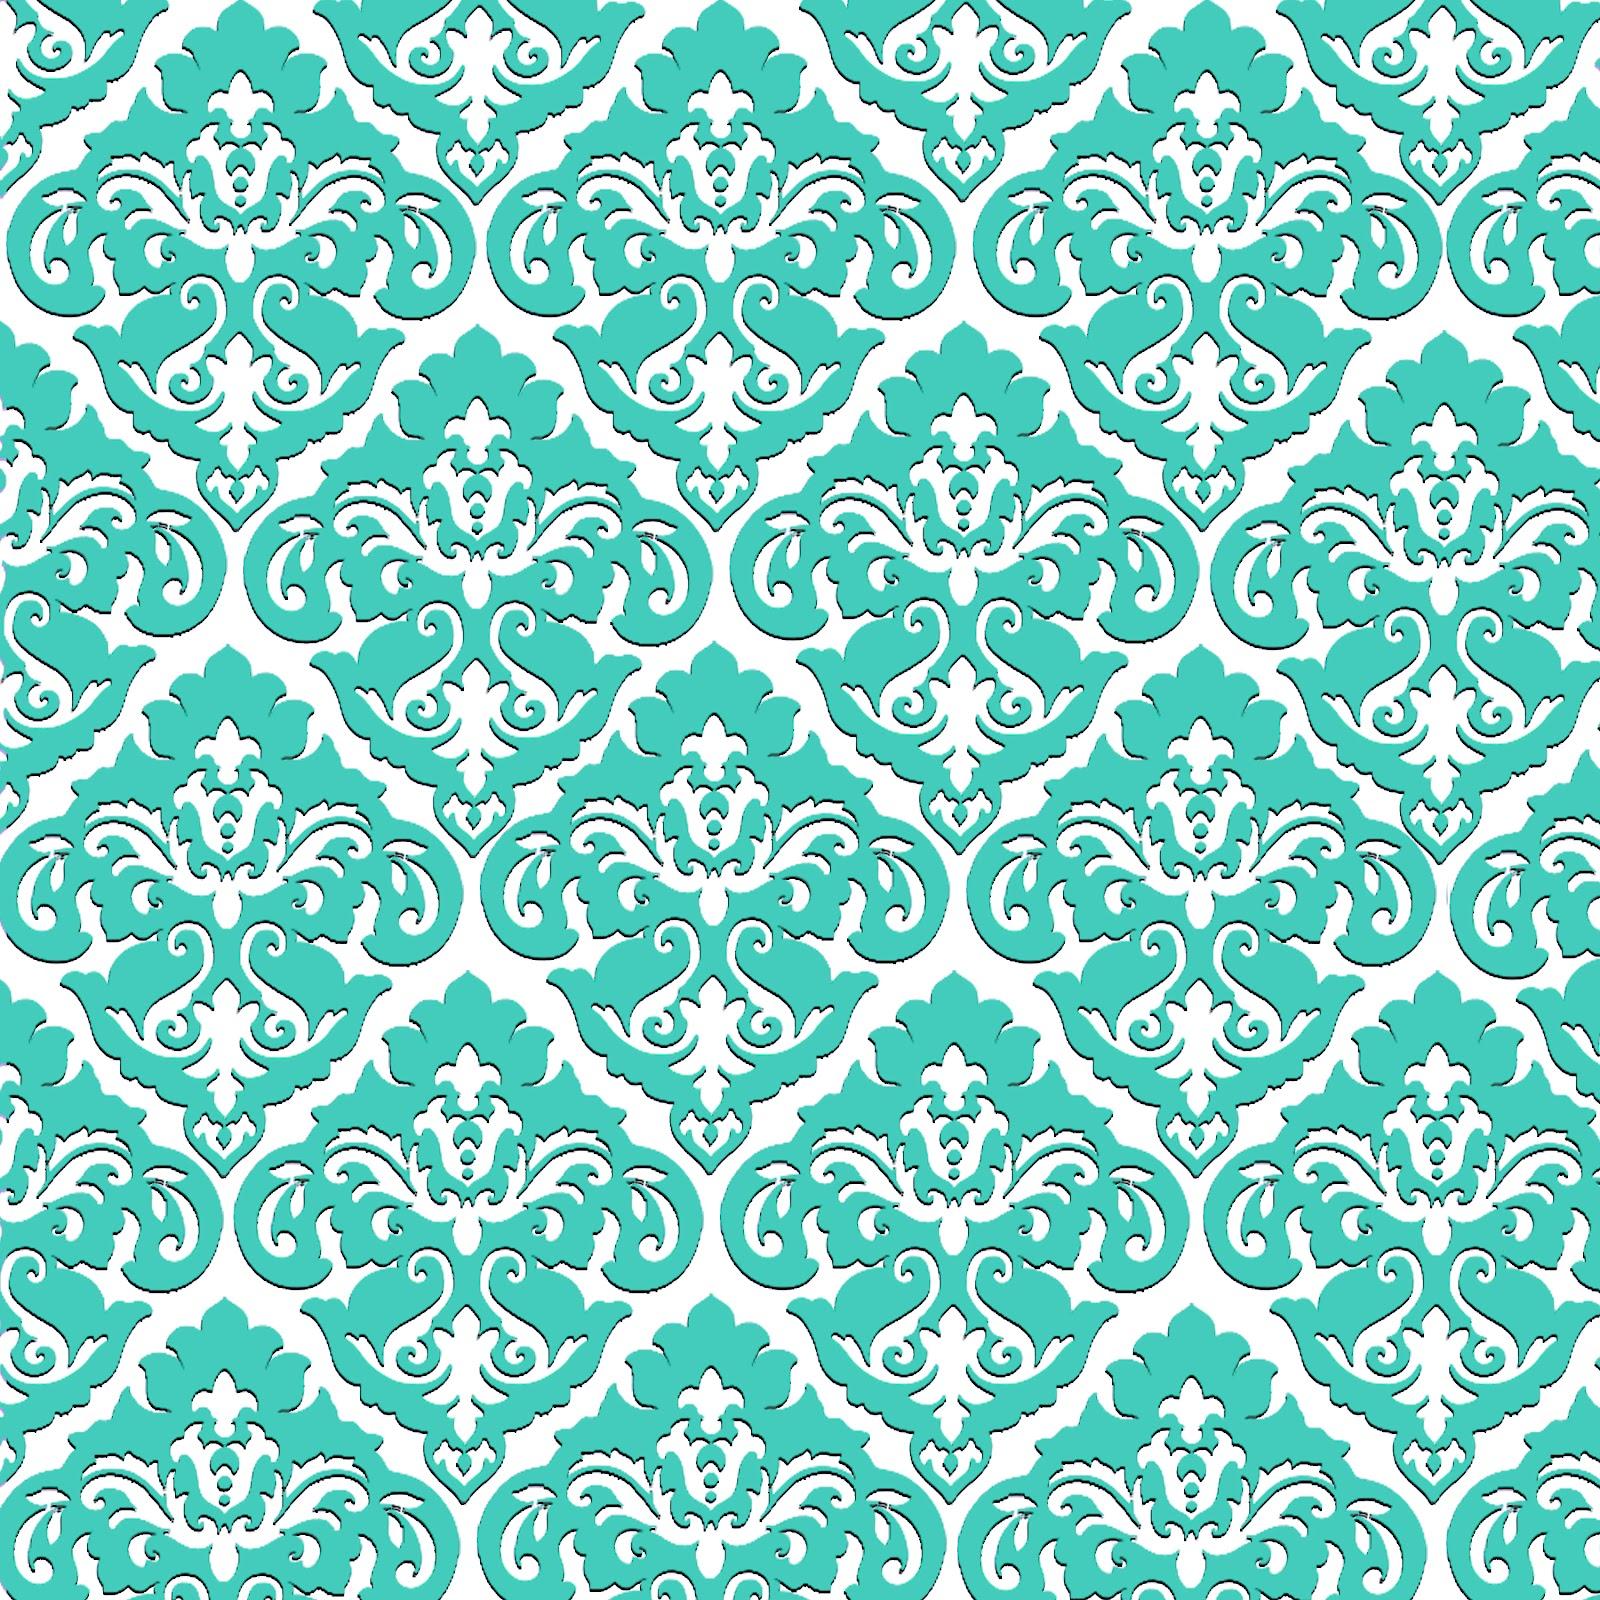 Teal chevron print background teal chevron background patterns - Pretty Teal Wallpapers Wallpapersafari